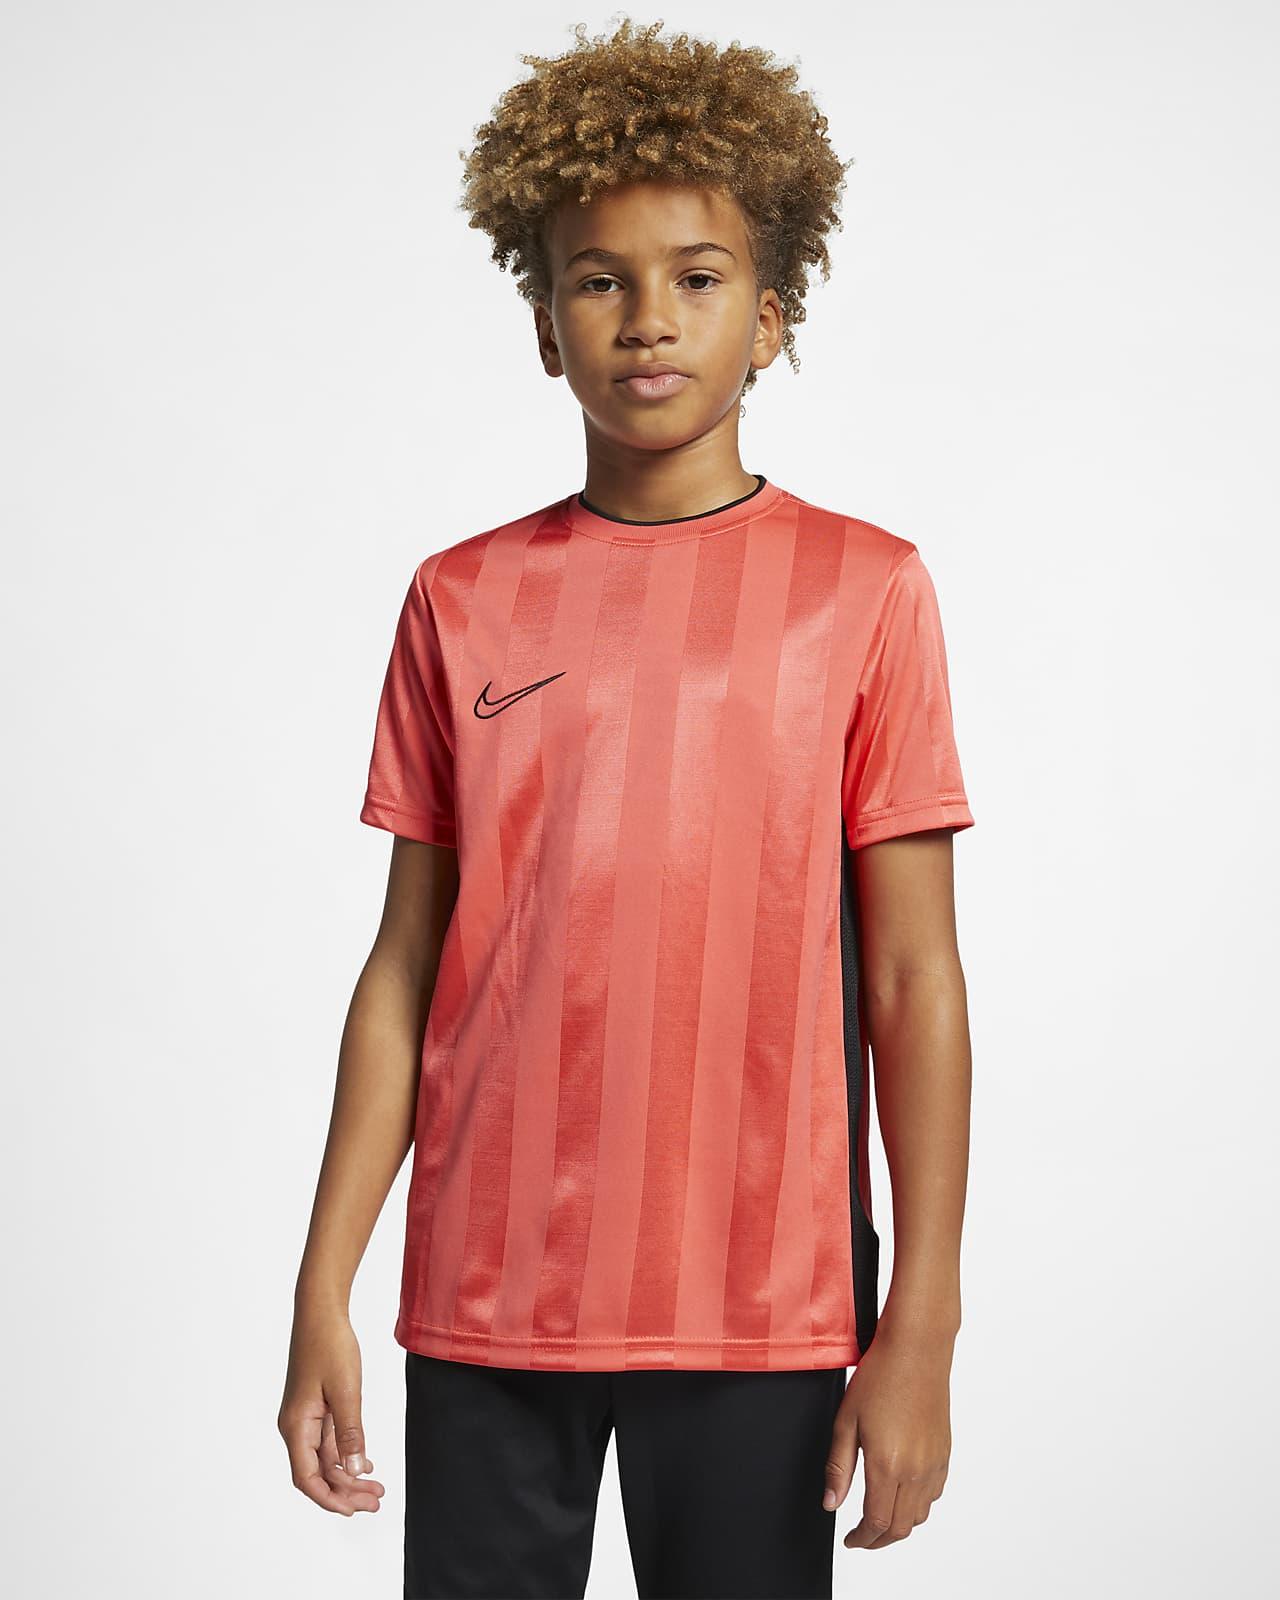 Short-Sleeve Football Top. Nike LU